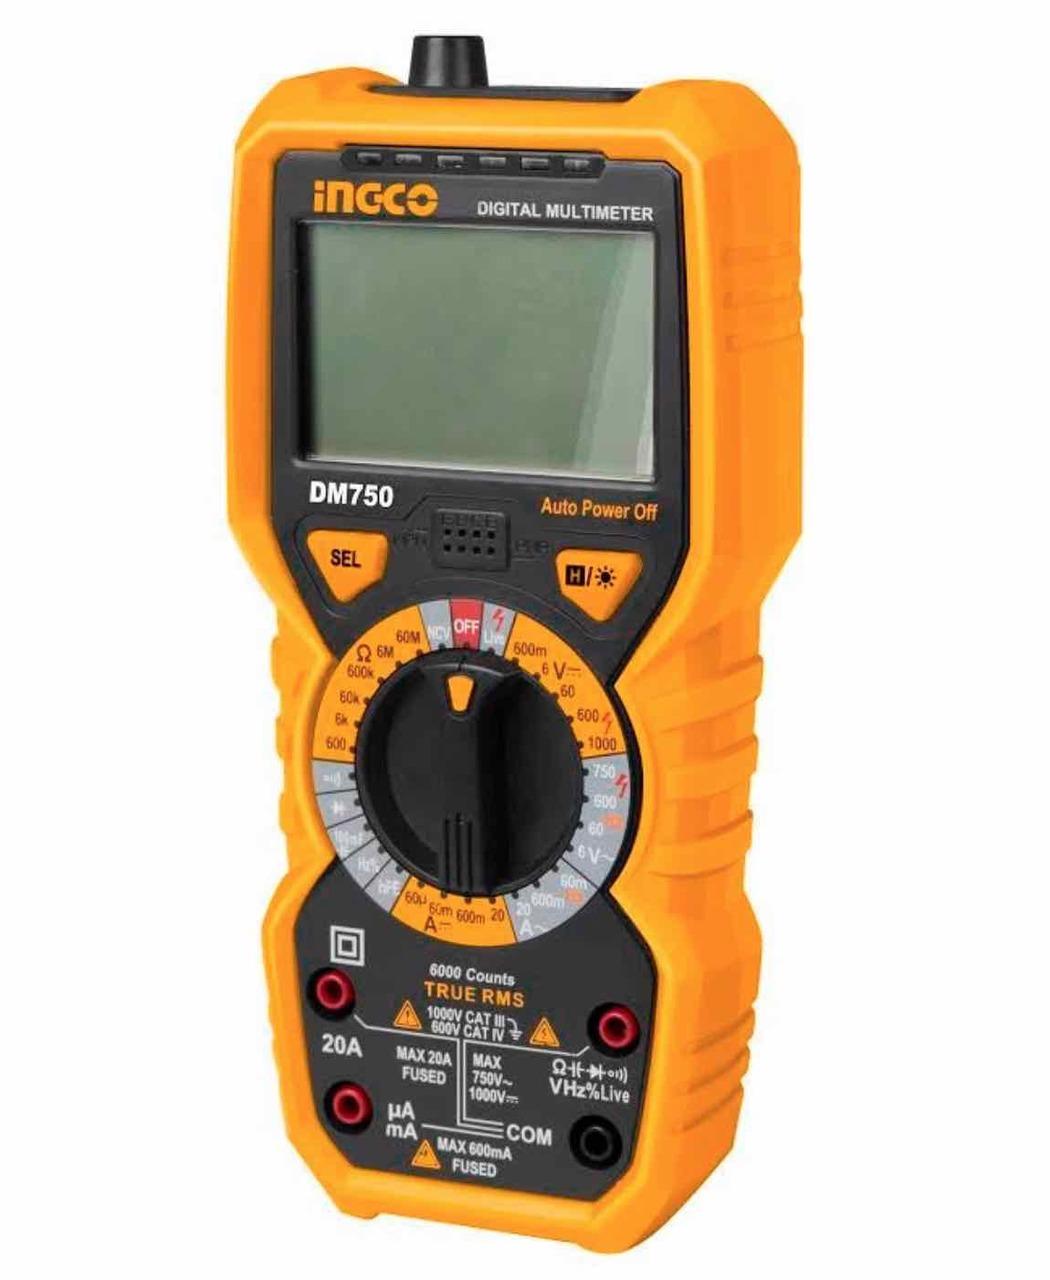 Digital_Multimeter_INGCO_DM750__61590.1556899718